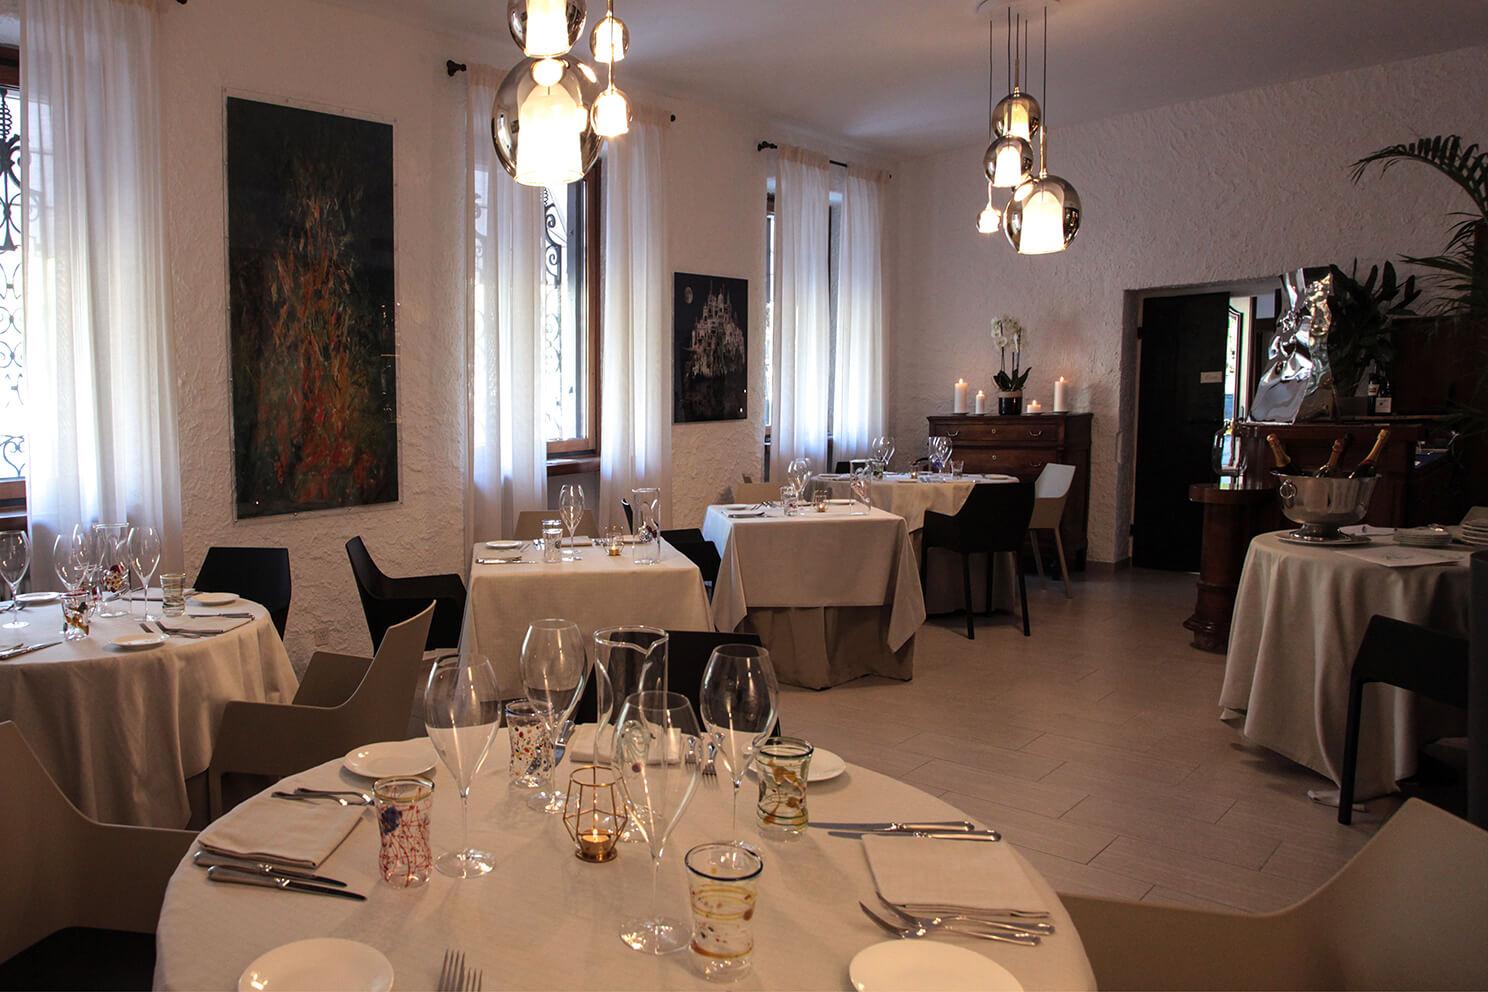 foto sala ristorante